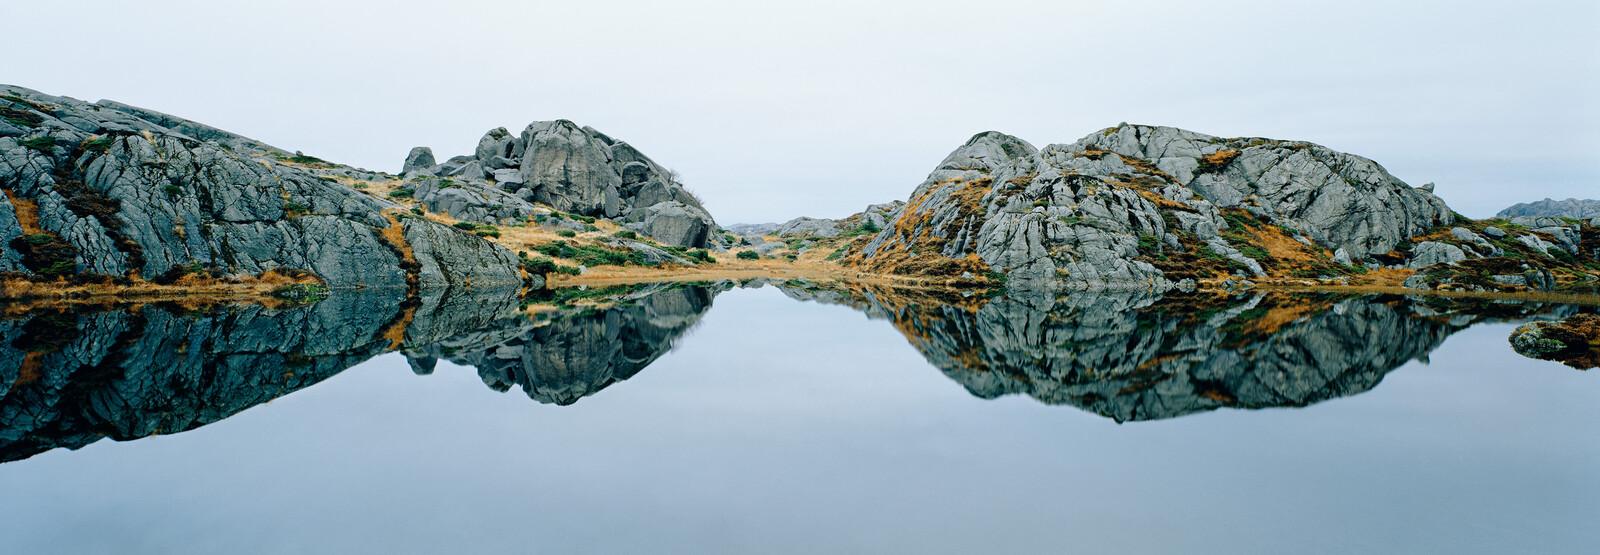 Eikeland, Telemark, South Norway - Axel M. Mosler